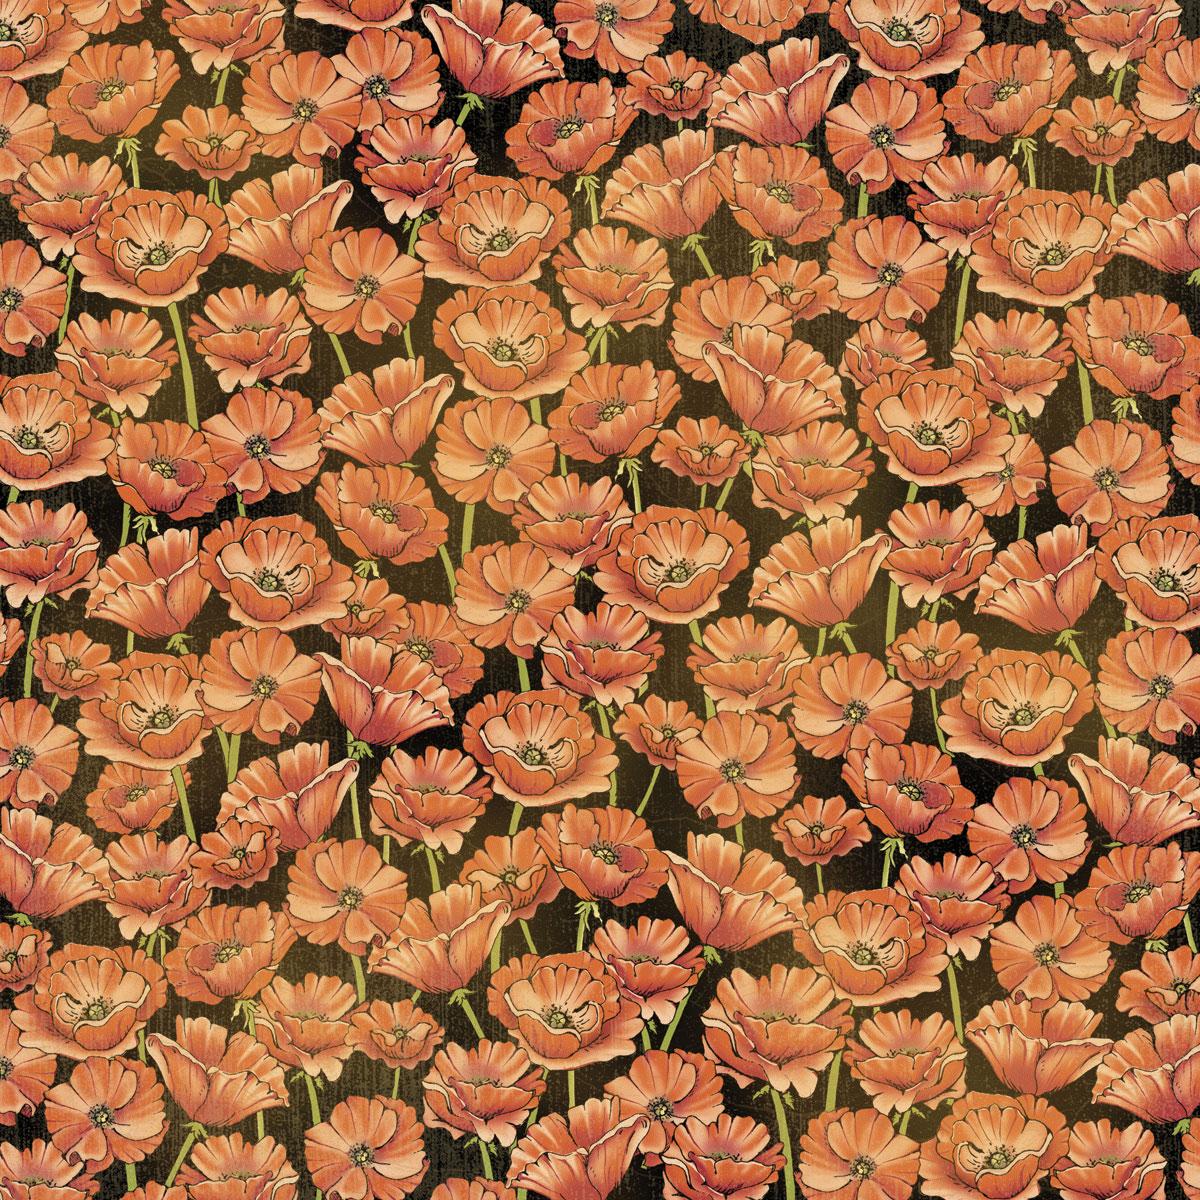 Poppy-field-frt